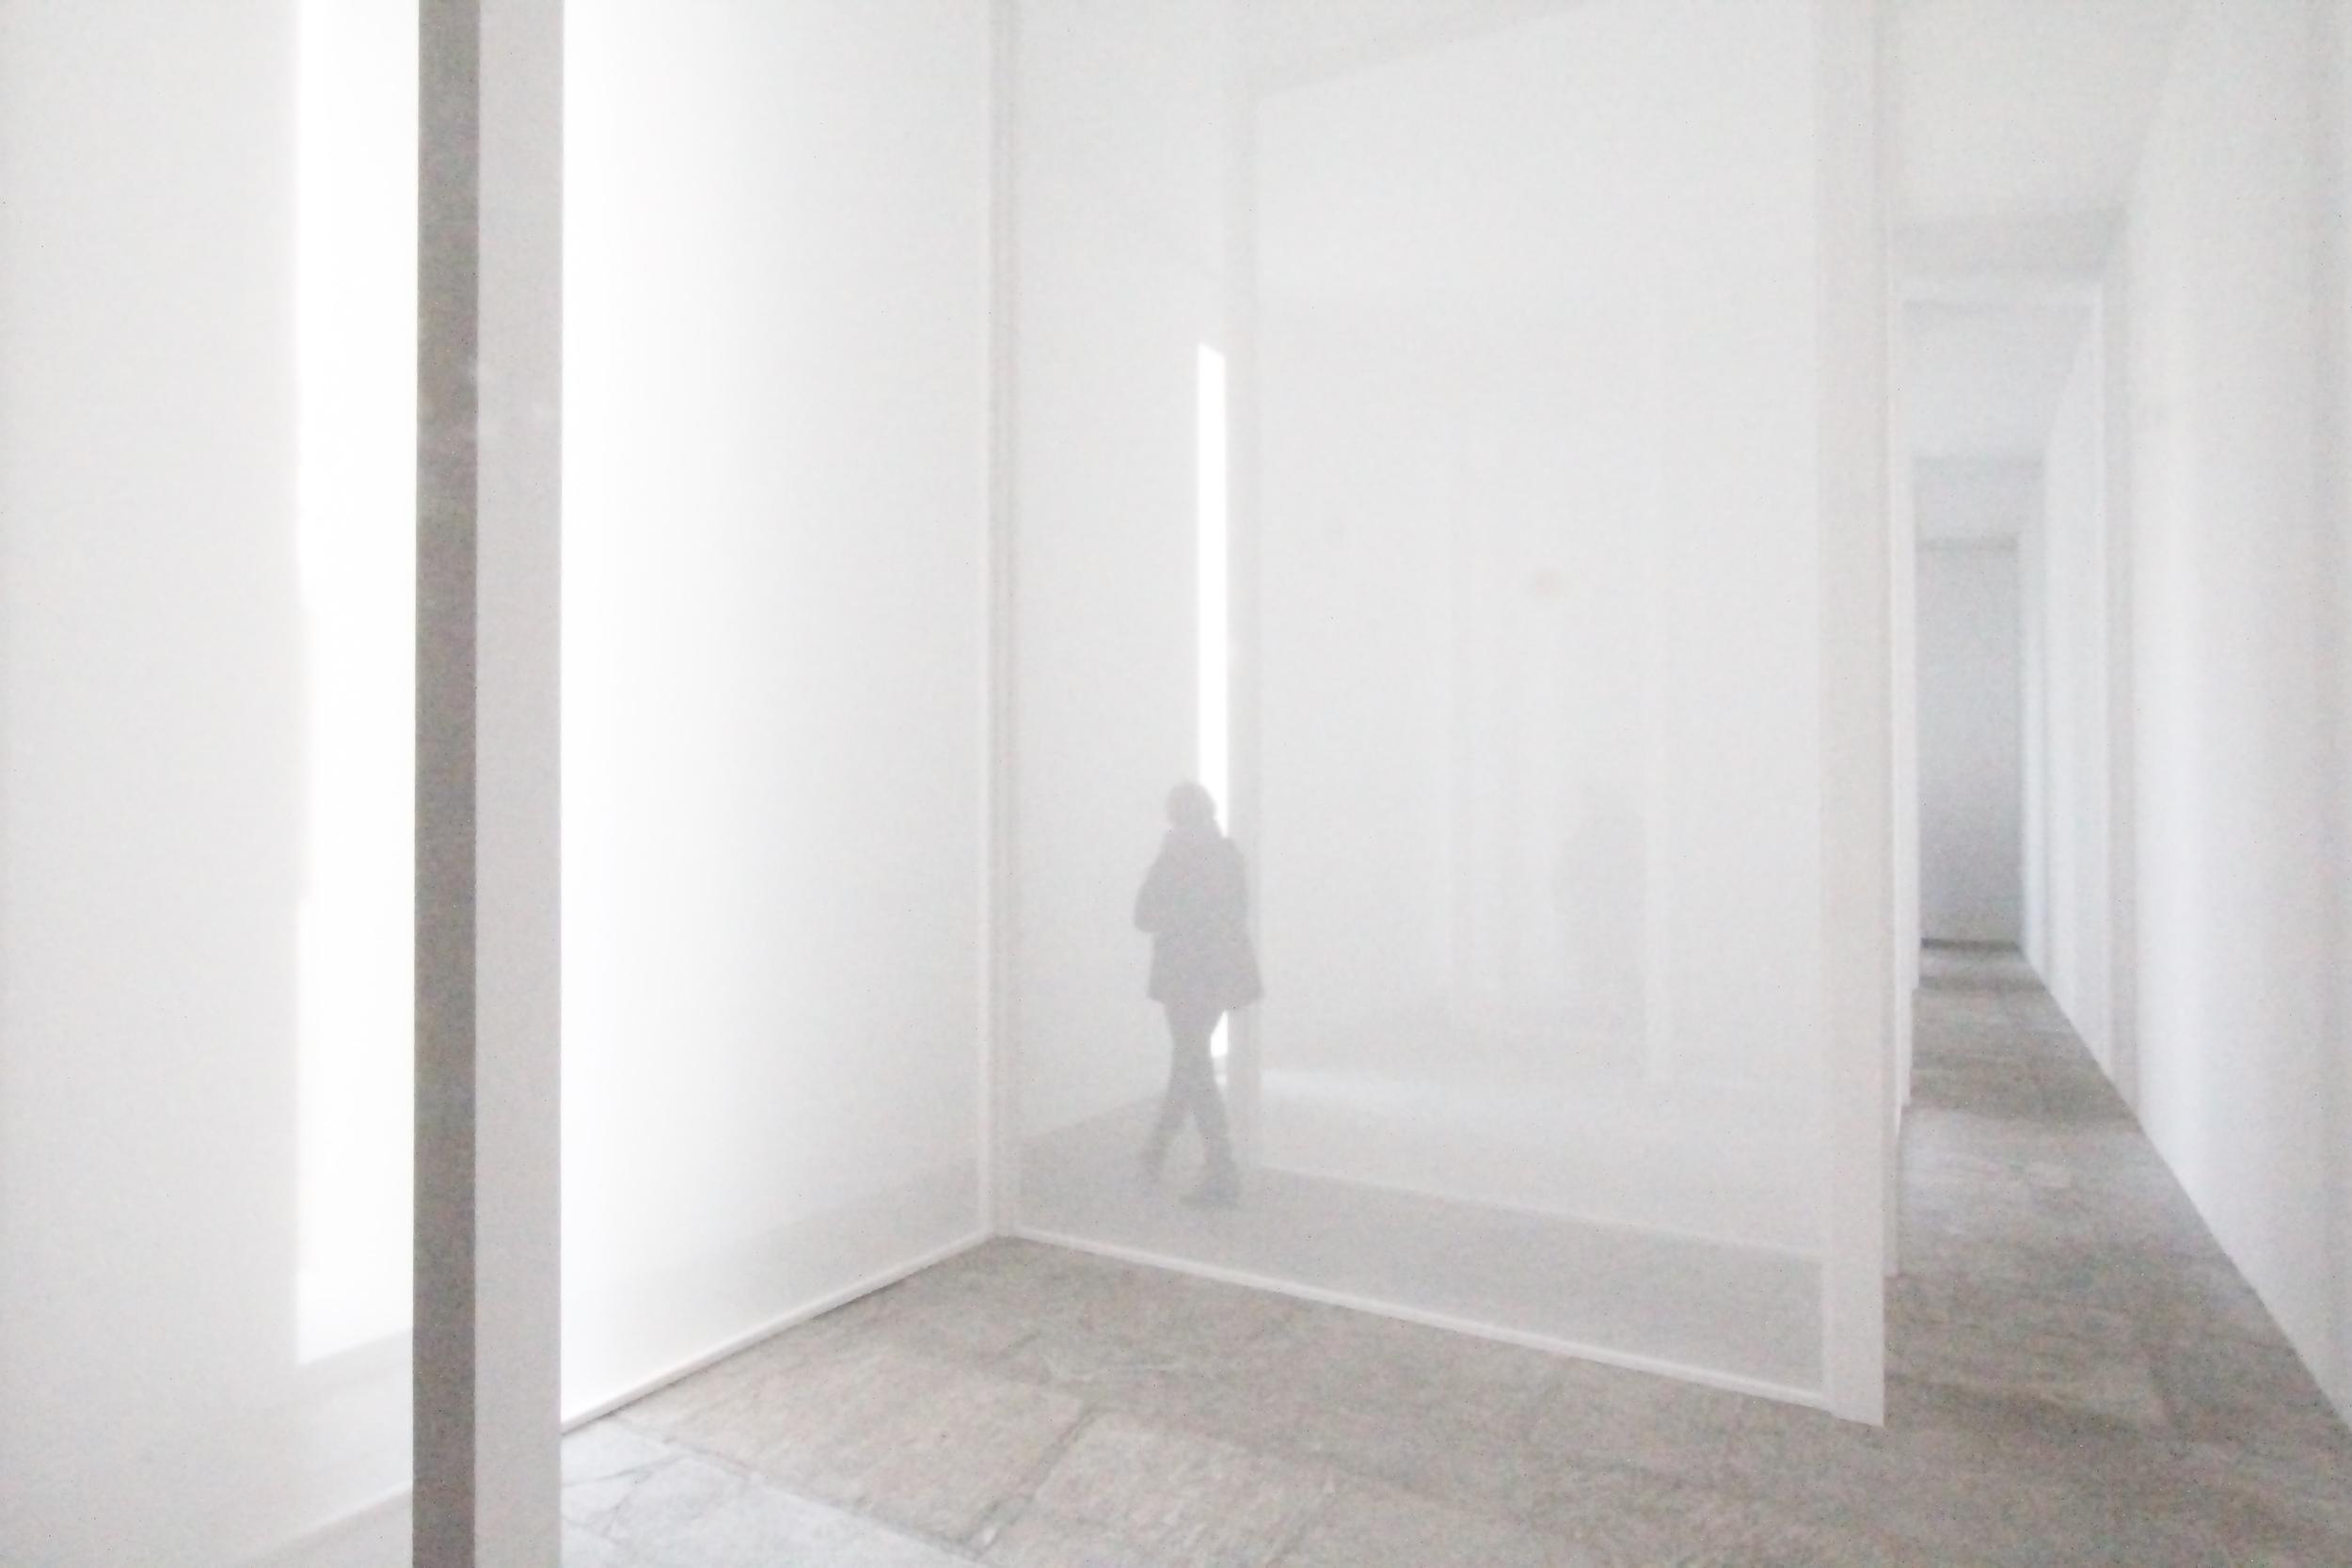 Varese Scrim 2013.  Robert Irwin ; nylon scrim.